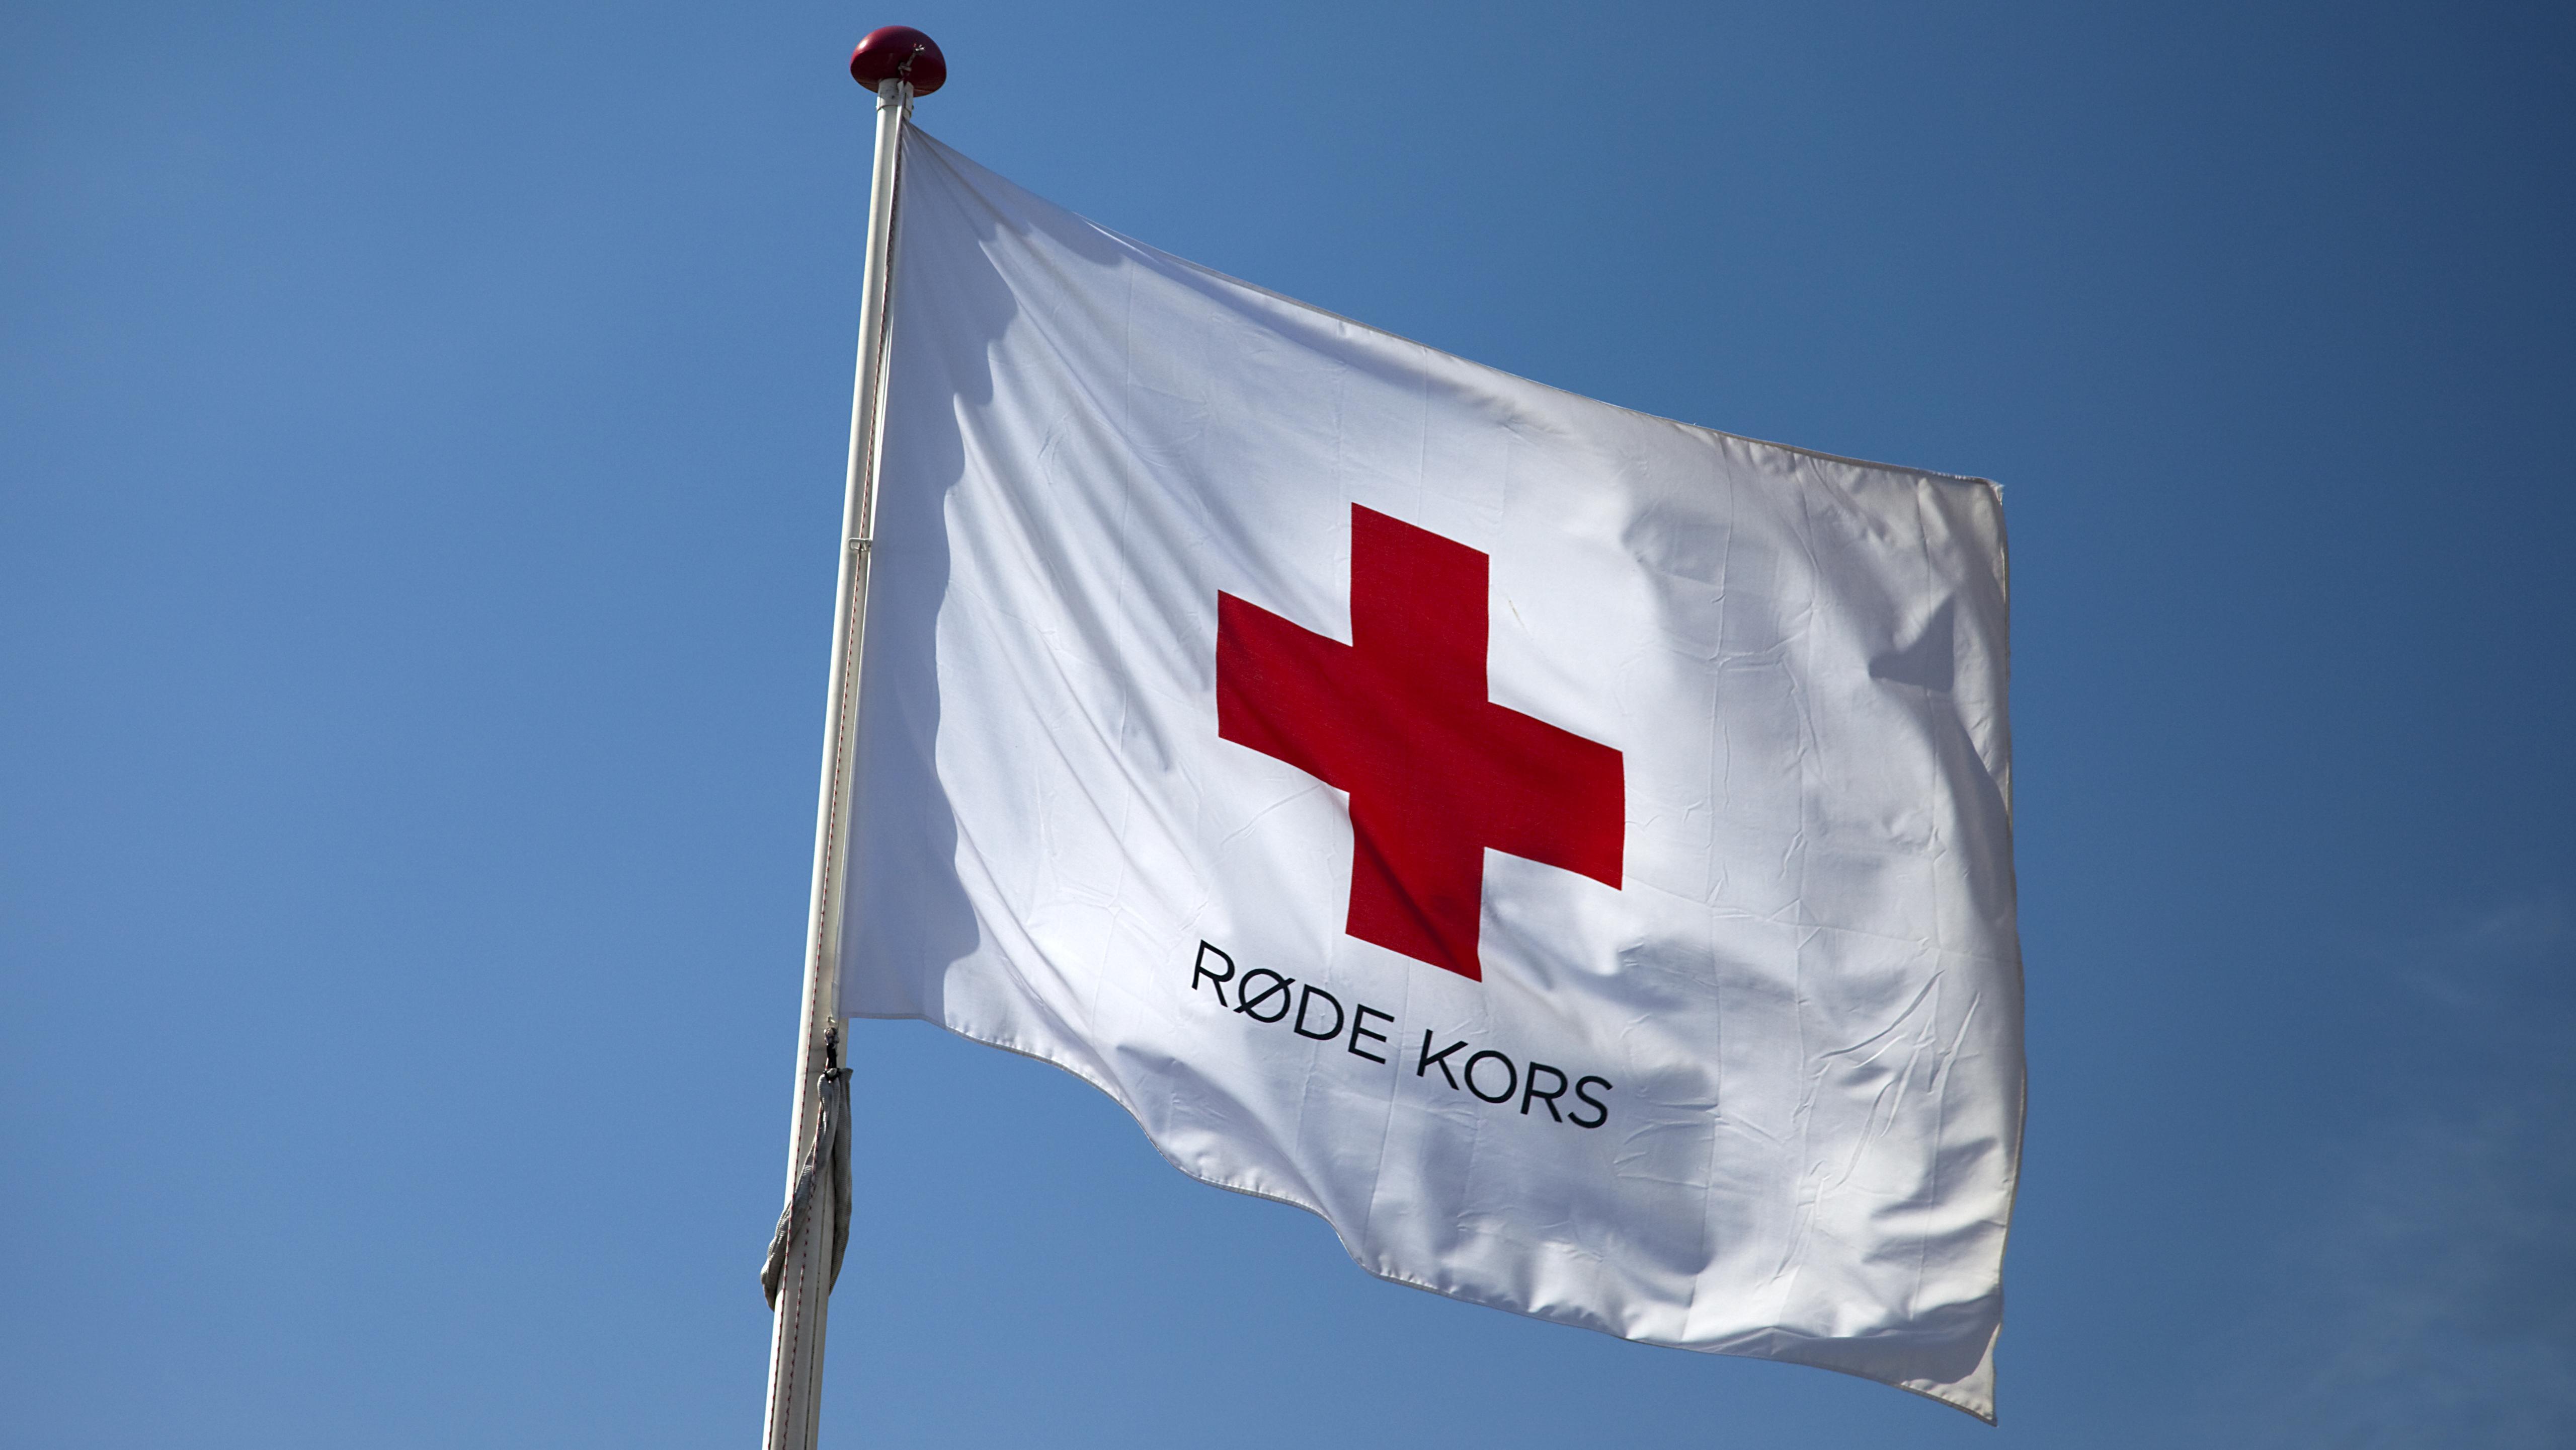 Røde kors pressefoto